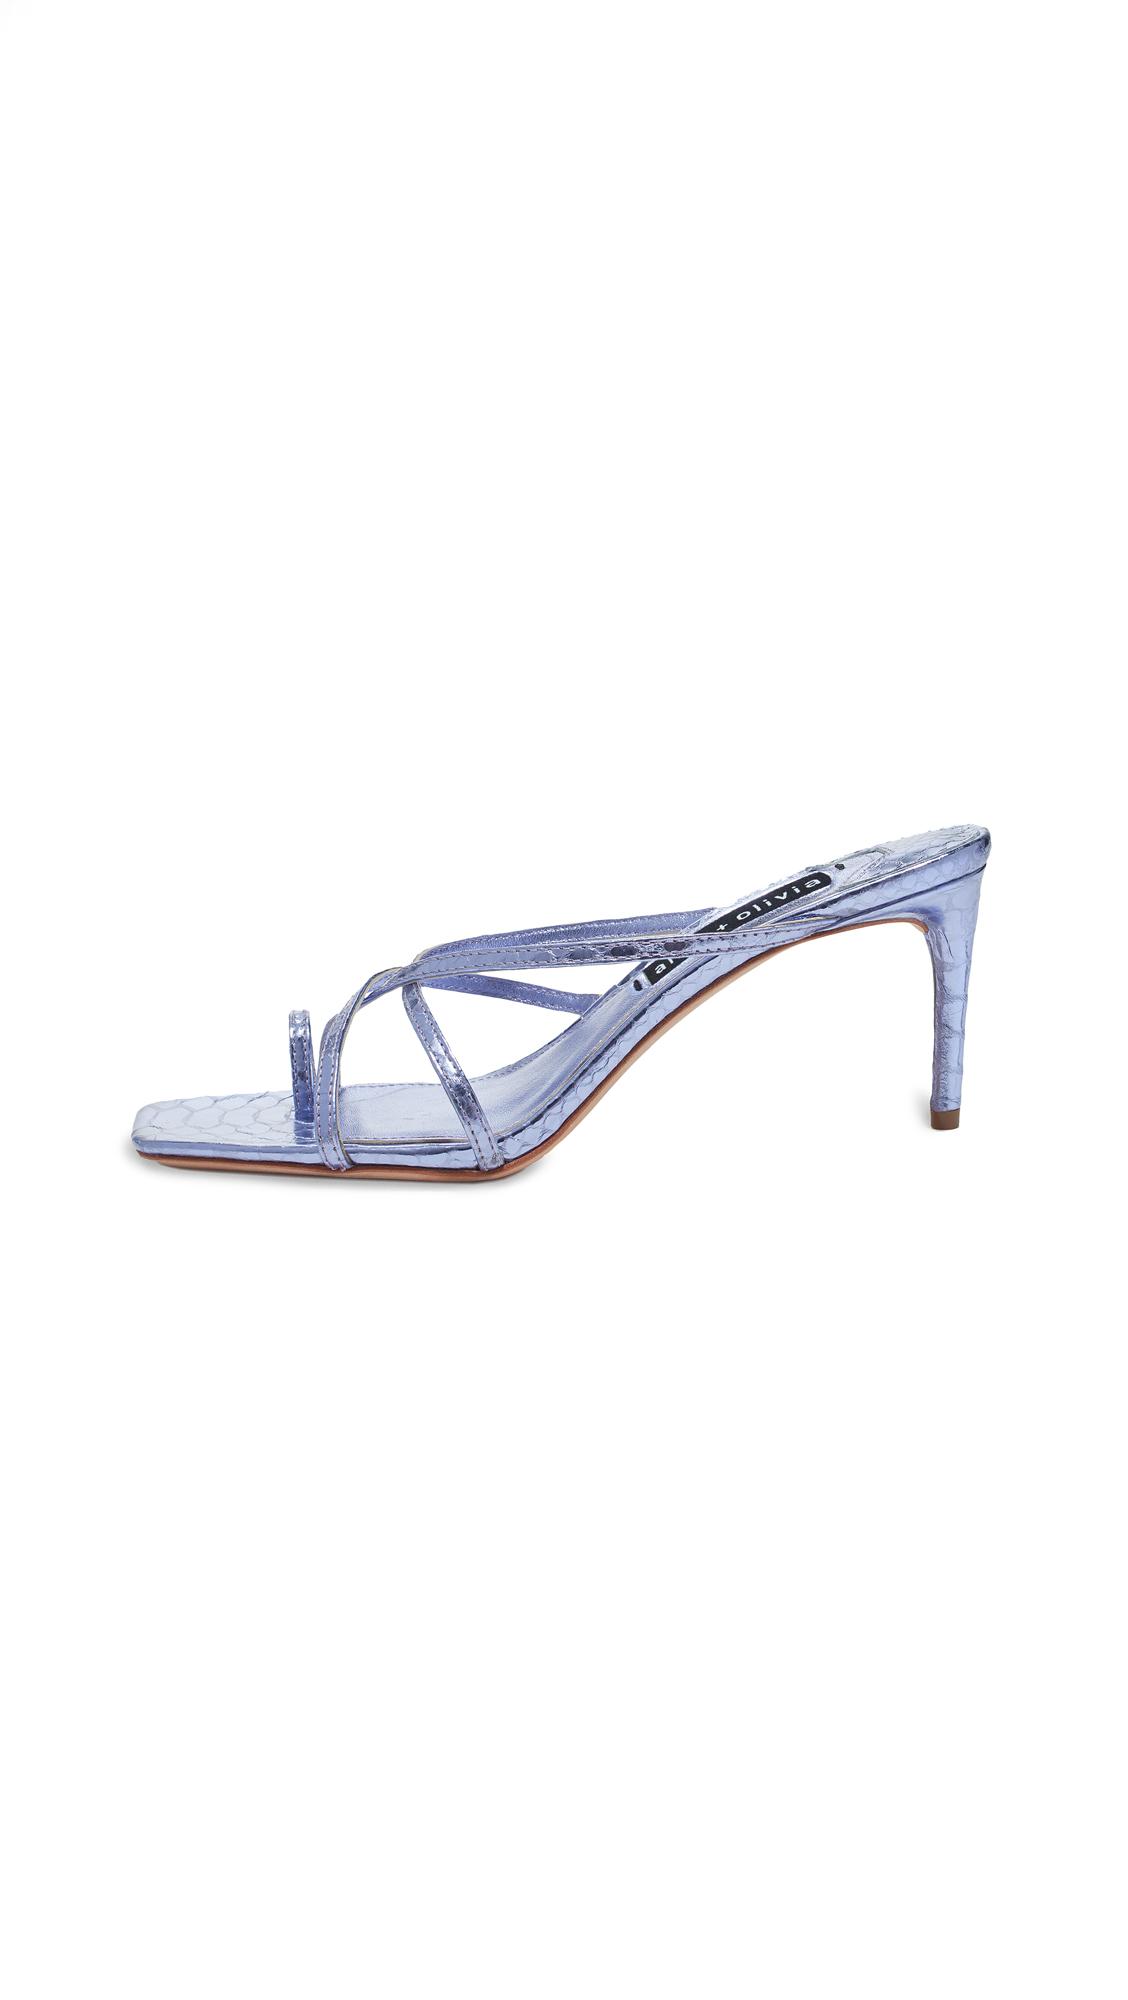 Buy alice + olivia Sabrine Sandal online, shop alice + olivia